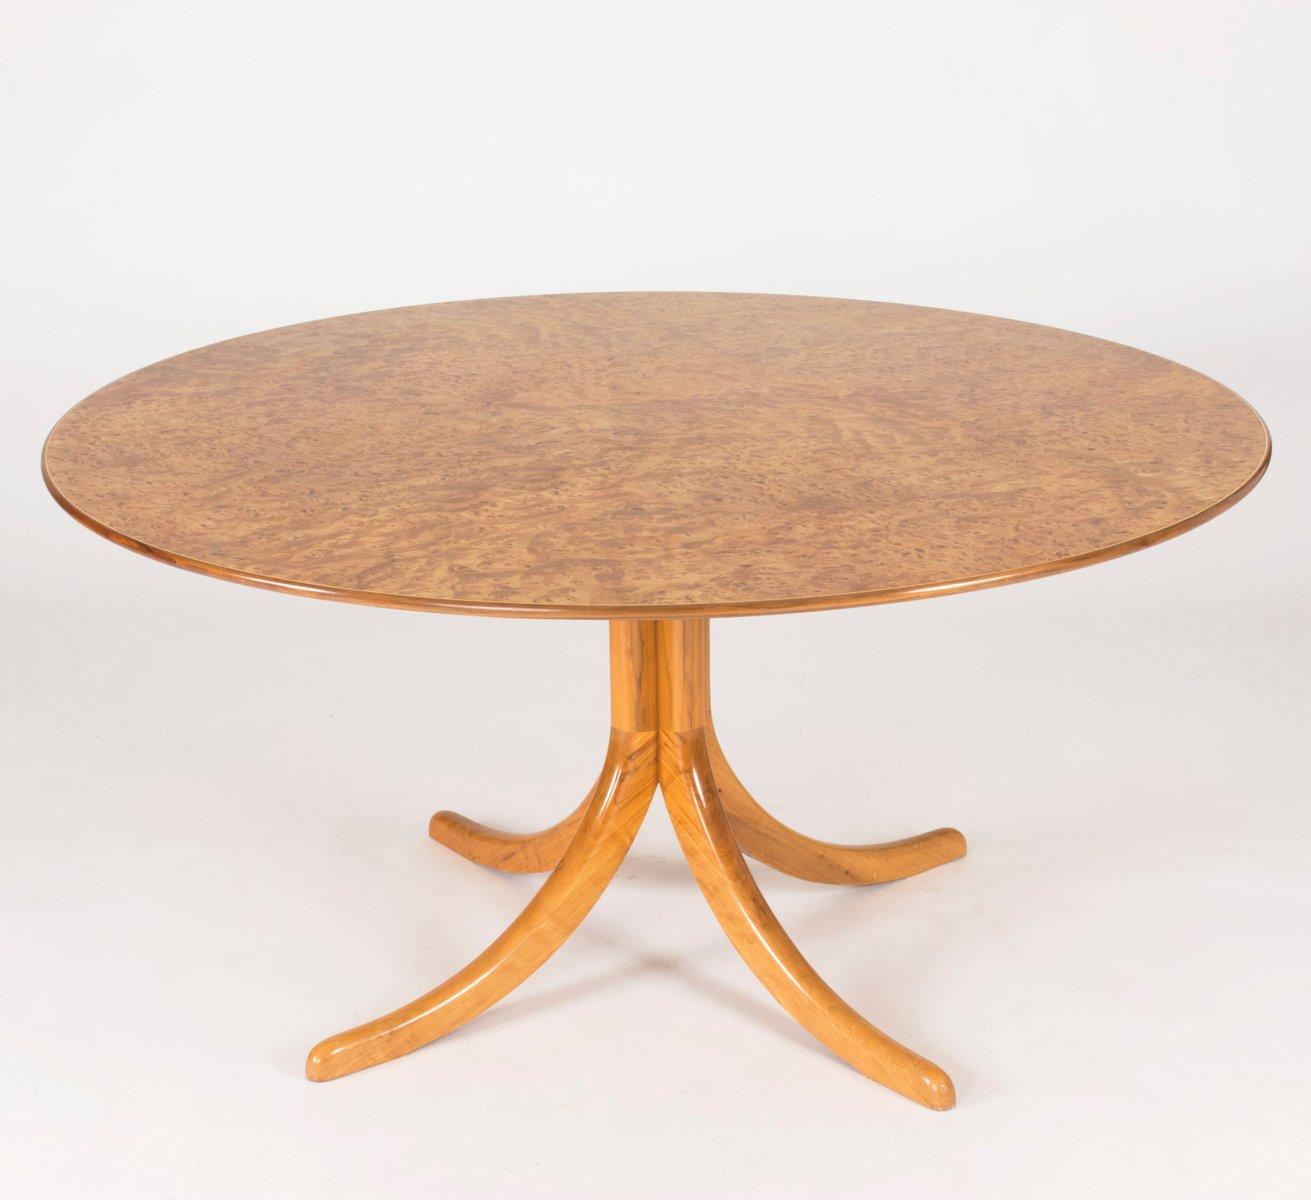 Swedish Alder Root Dining Table by Josef Frank for Svenskt  : swedish alder root dining table by josef frank for svenskt tenn 1950s 2 from www.pamono.com size 1311 x 1200 jpeg 67kB